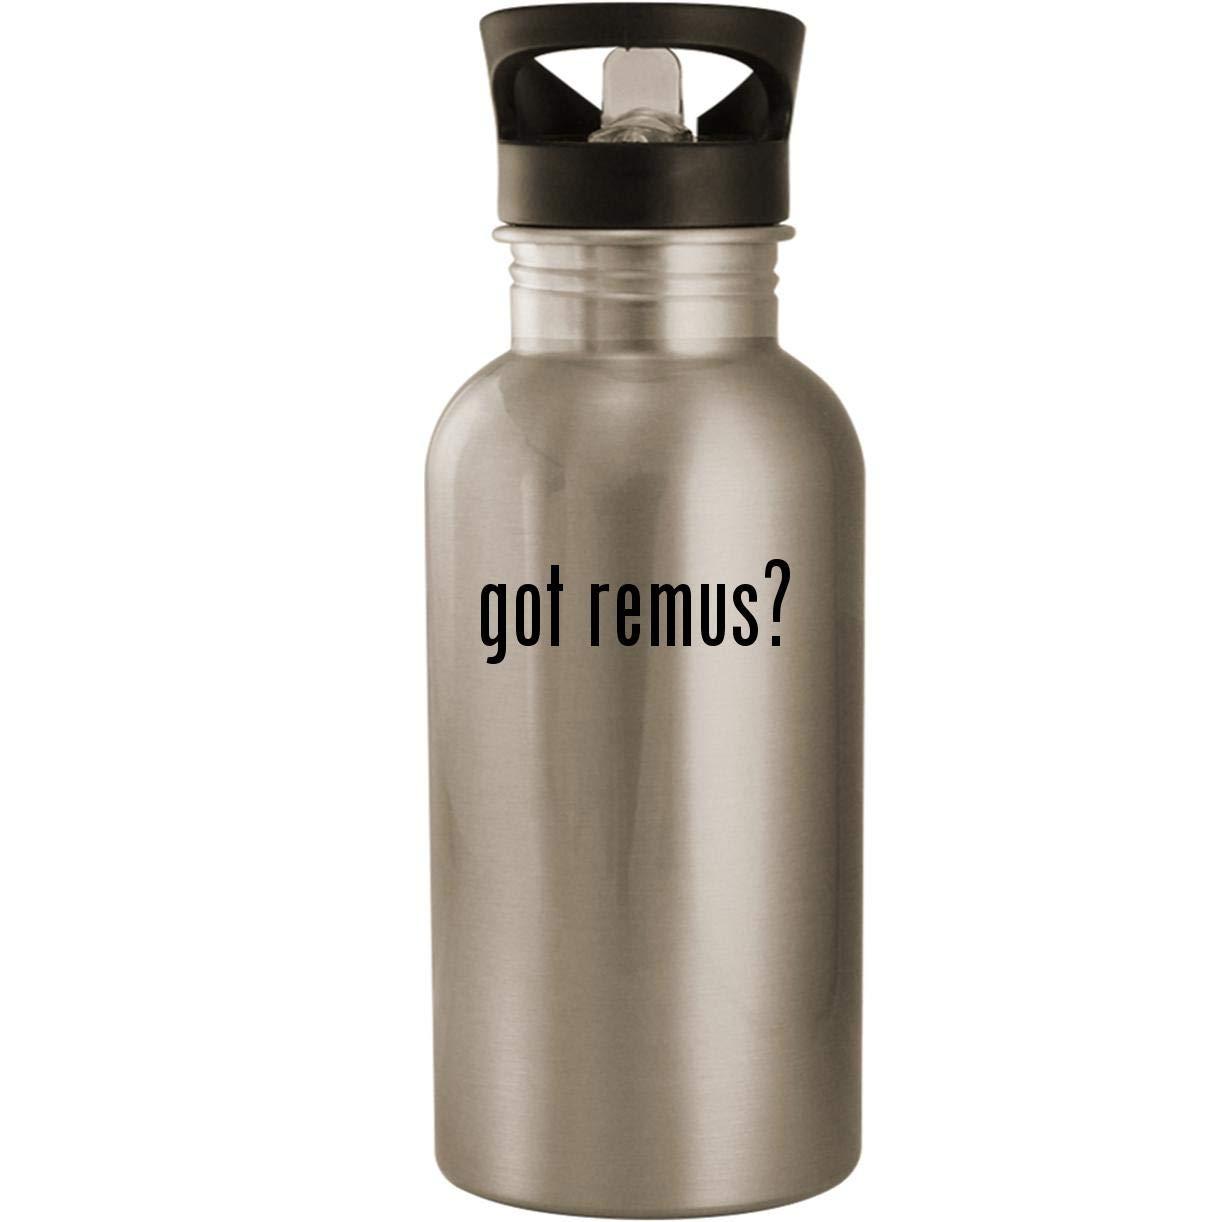 got remus - ステンレススチール製20オンスのロード対応ウォーターボトル。 シルバー US-C-07-18-01-083838-04-26-18-26 B07GN8DJFL シルバー